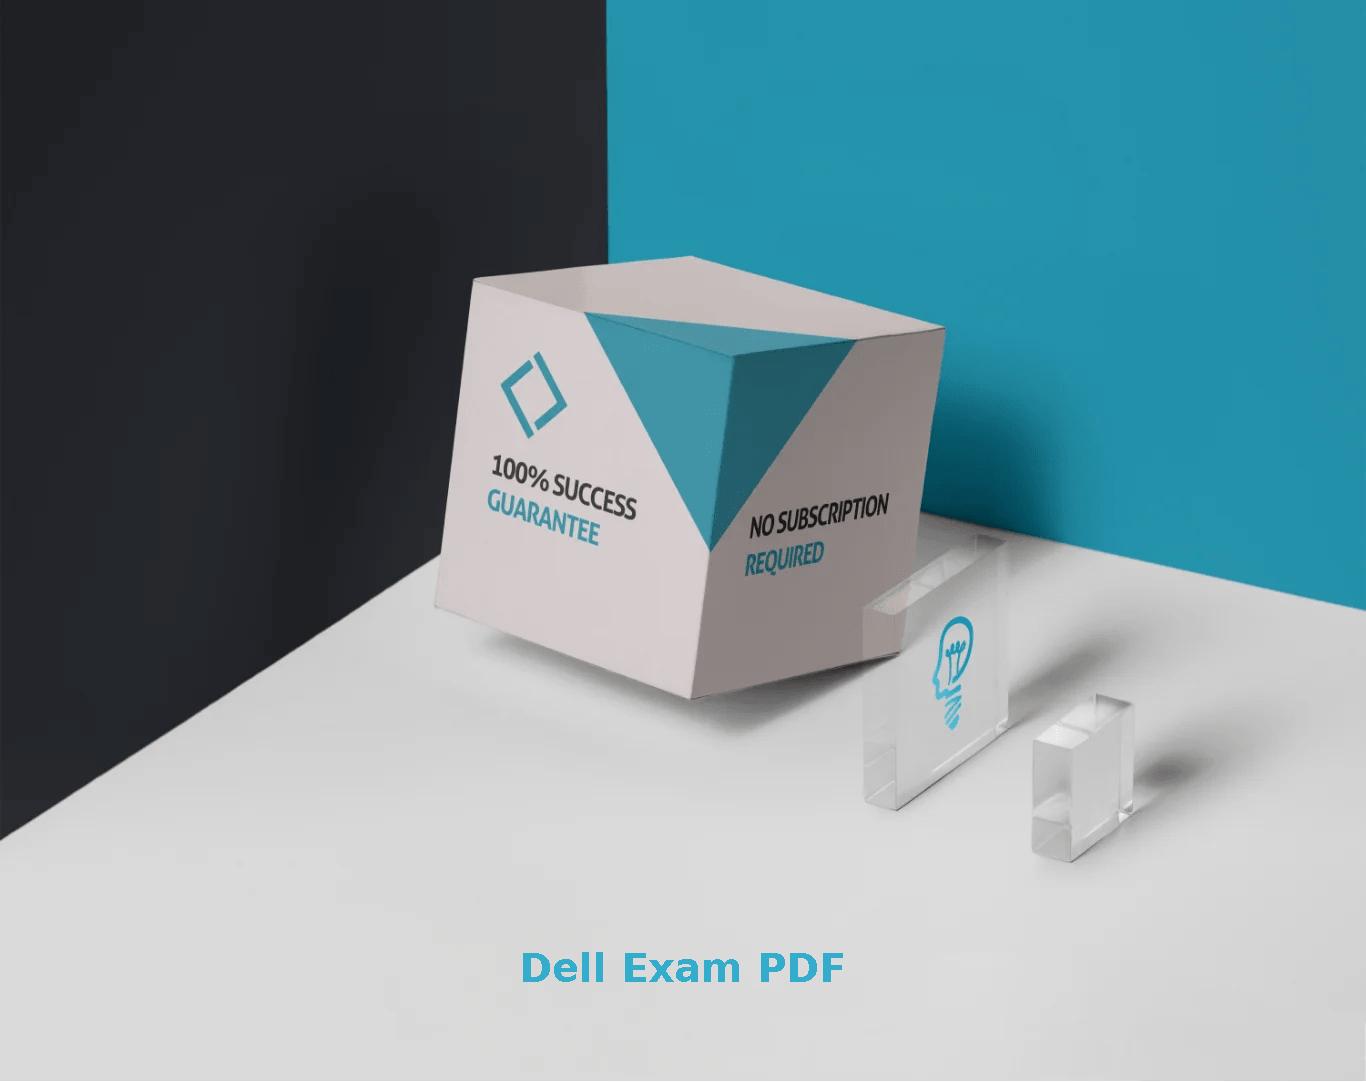 Dell Exam PDF